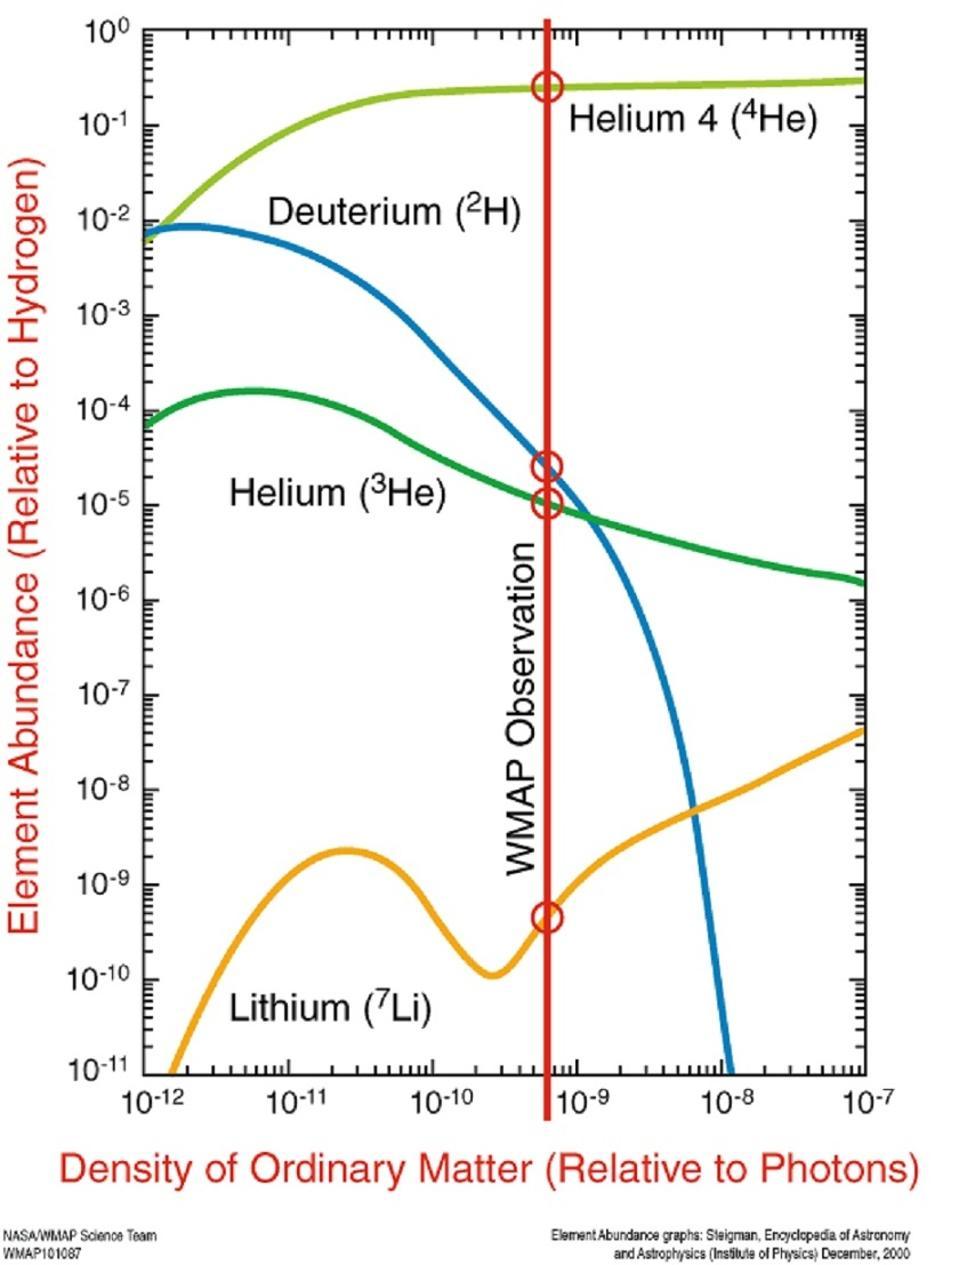 The abundances of helium, deuterium, helium-3 and lithium-7 from Big Bang Nucleosynthesis.